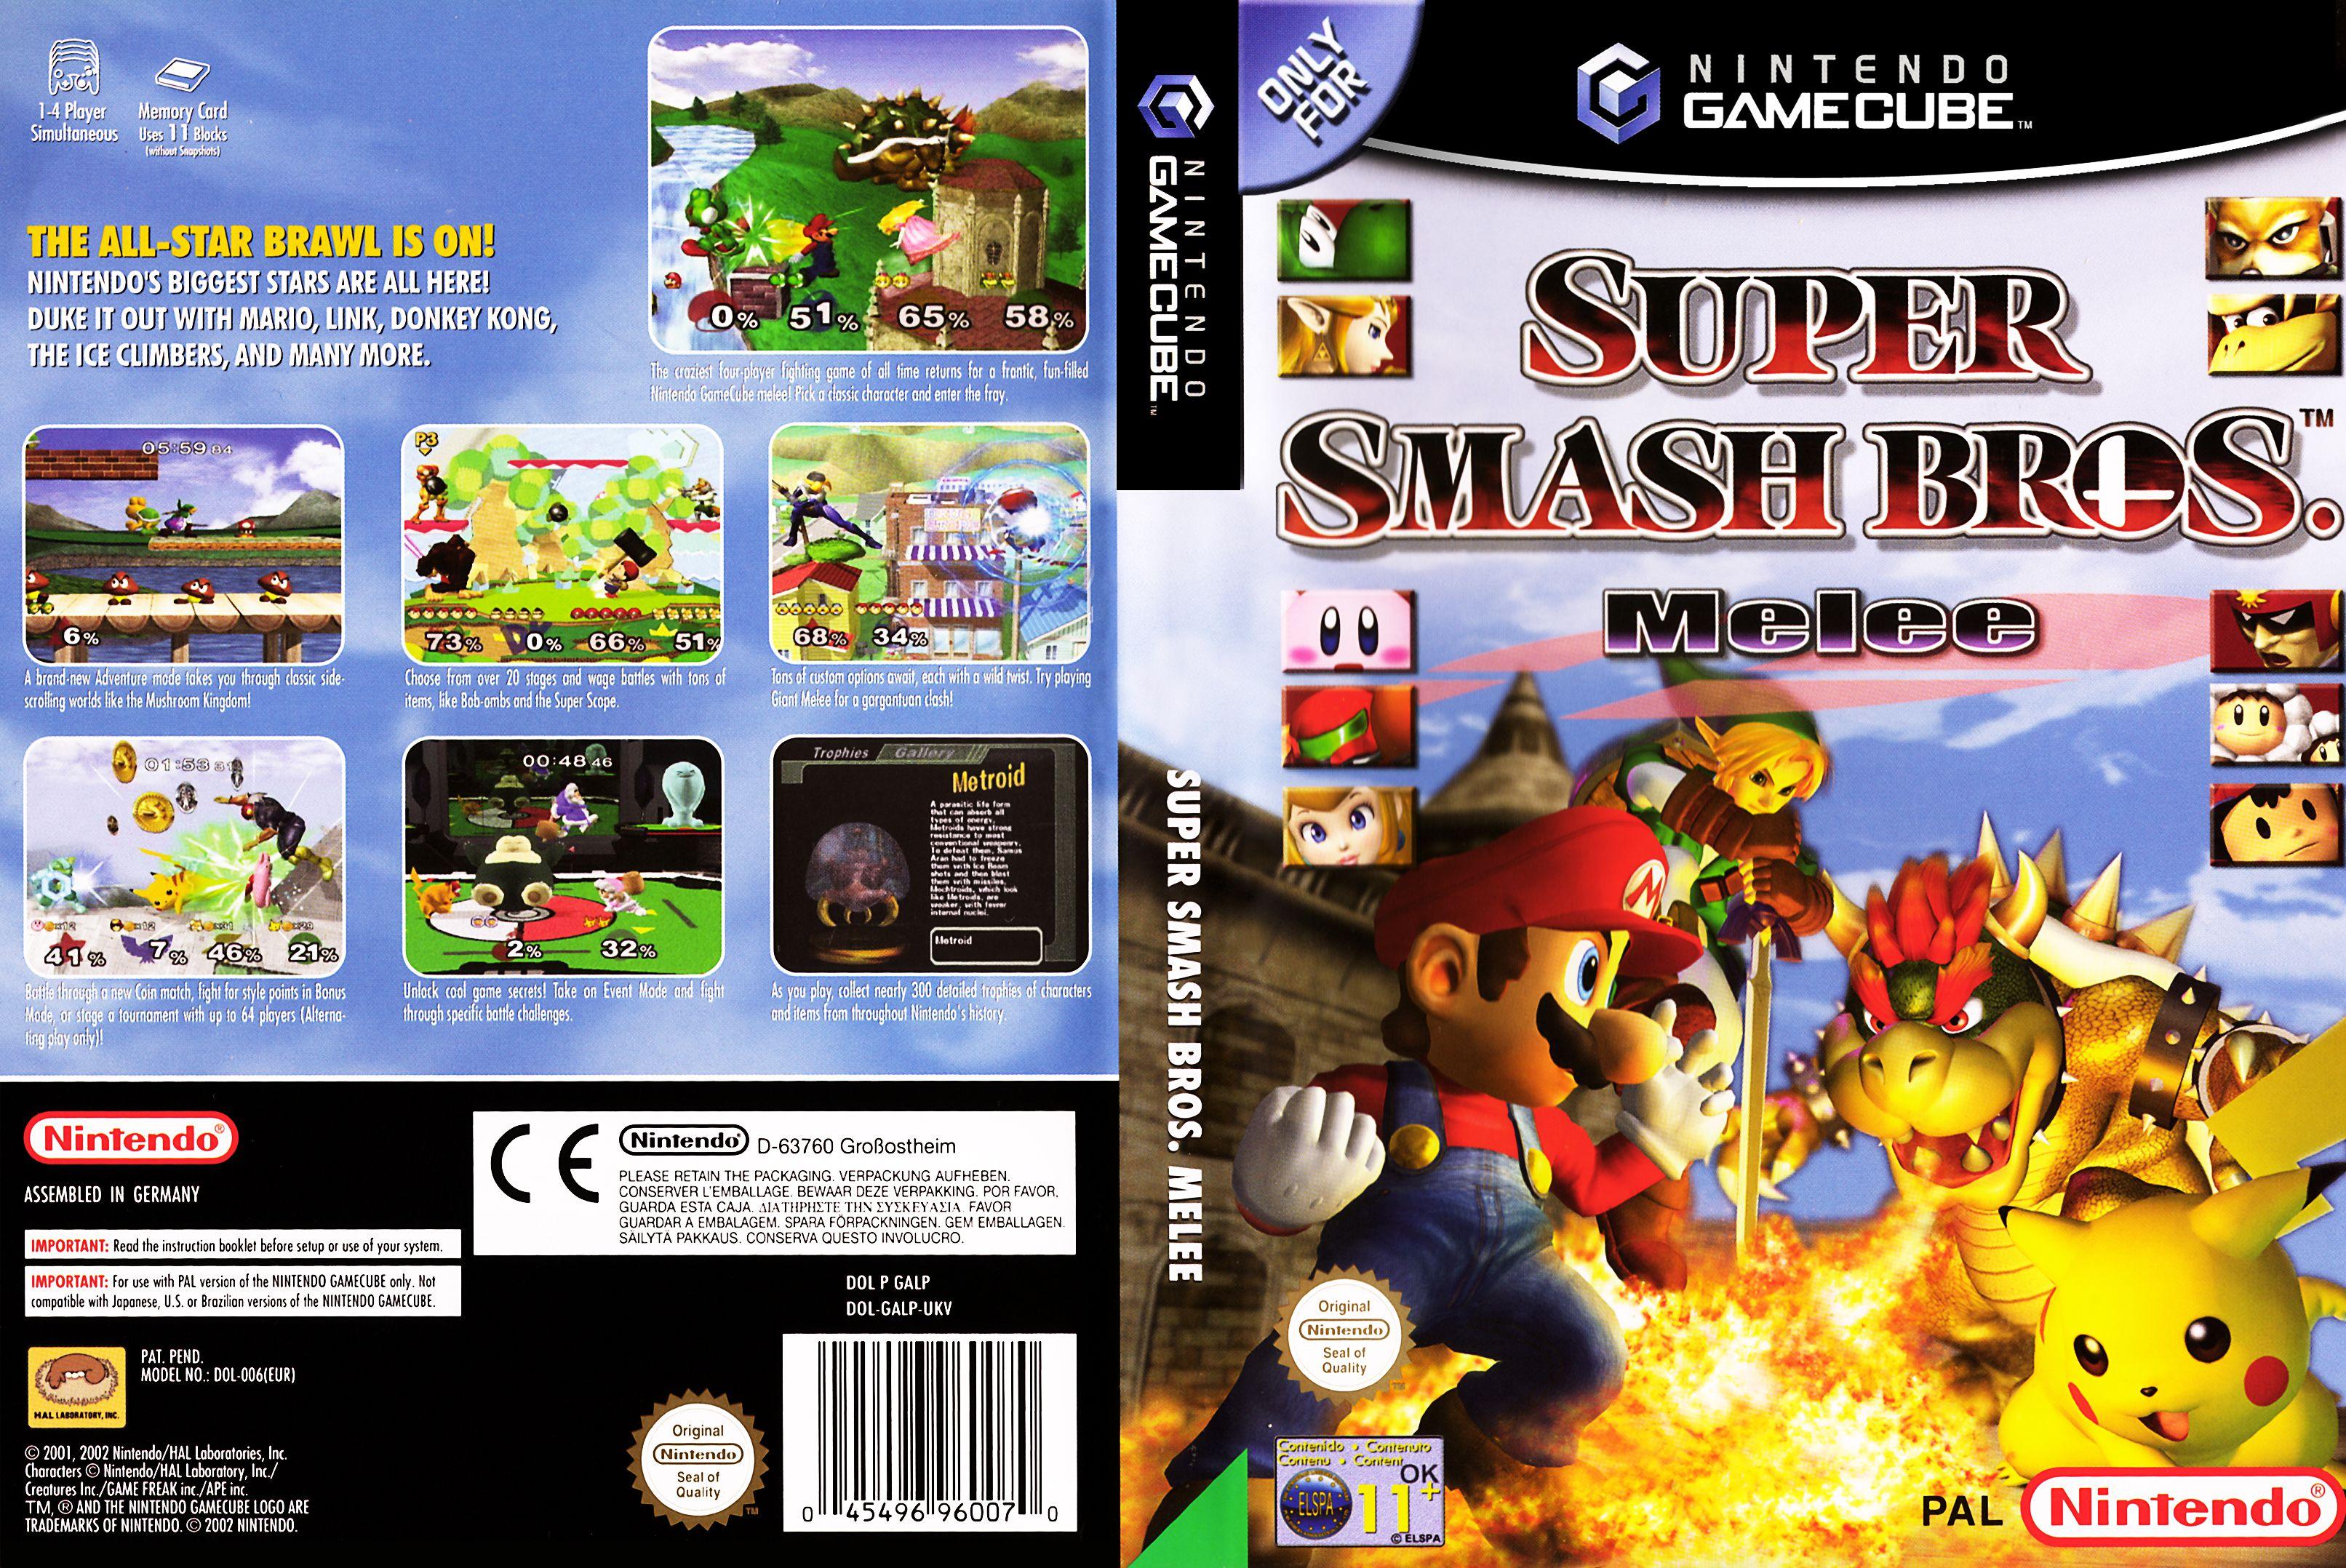 Super Smash Bros Melee Cheats For Gamecube